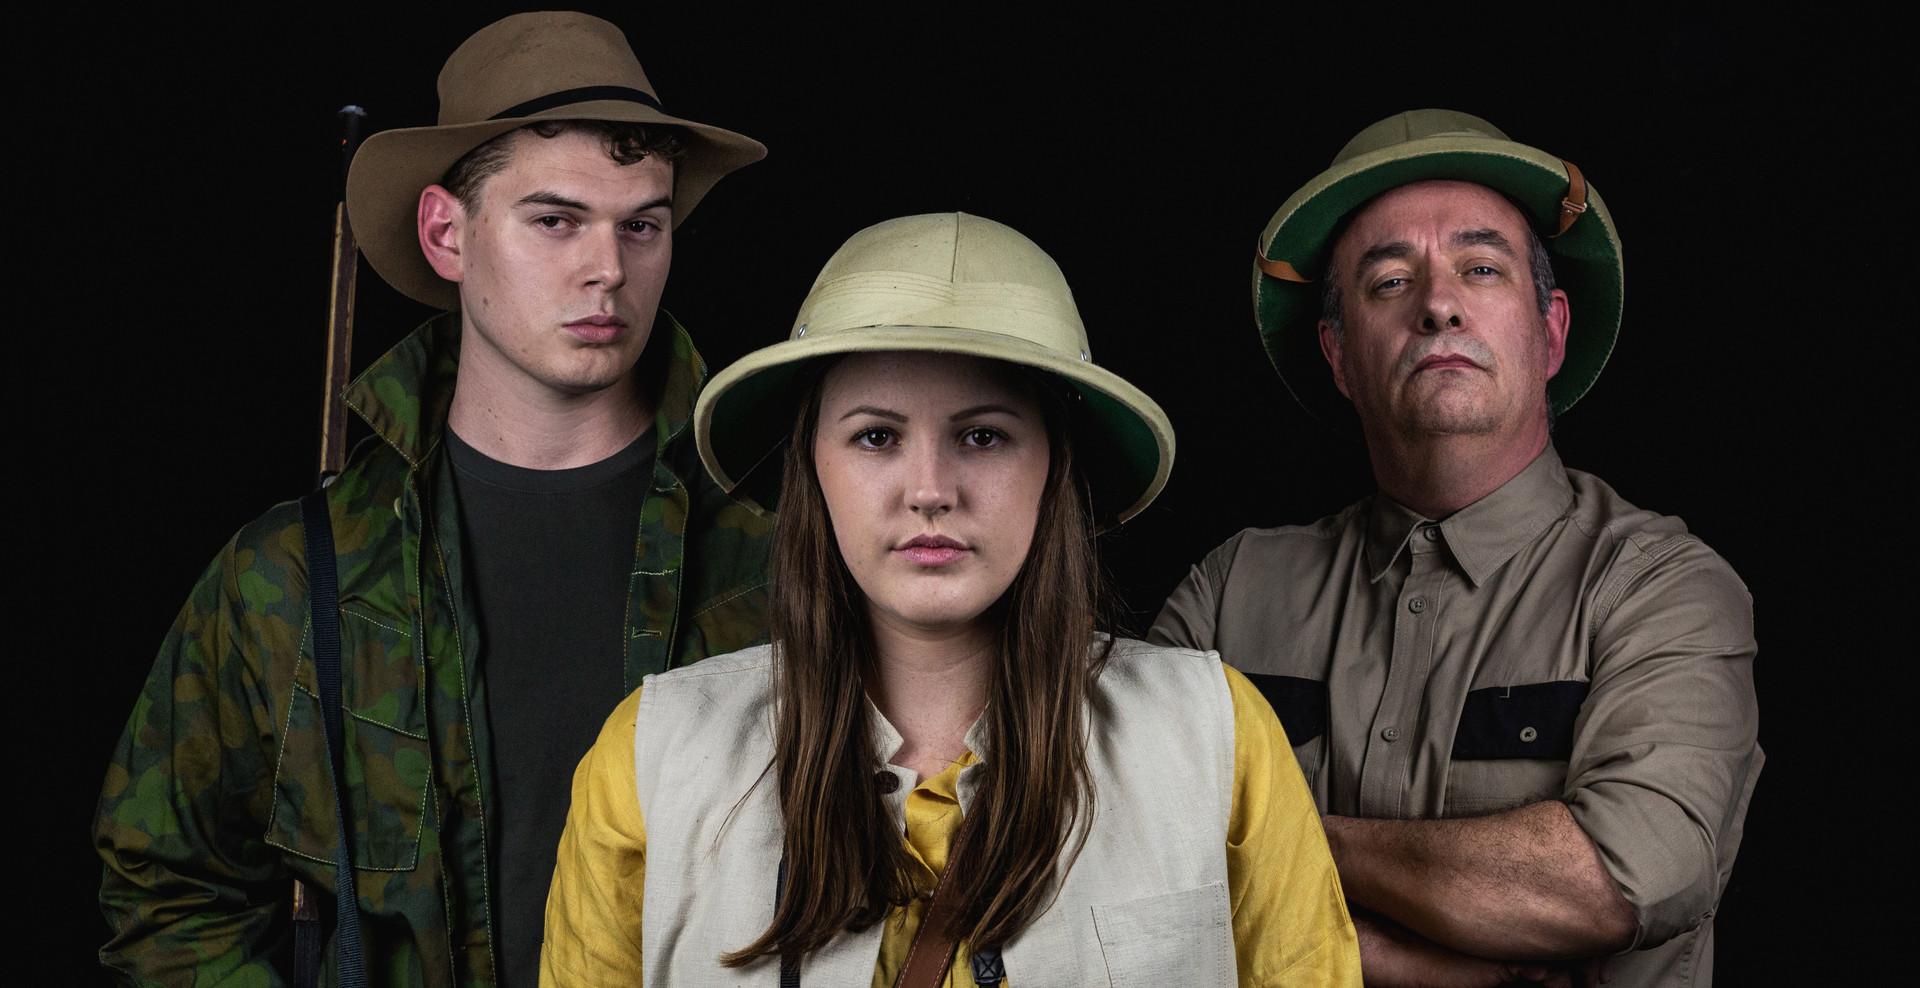 Clayton, Jane and Porter